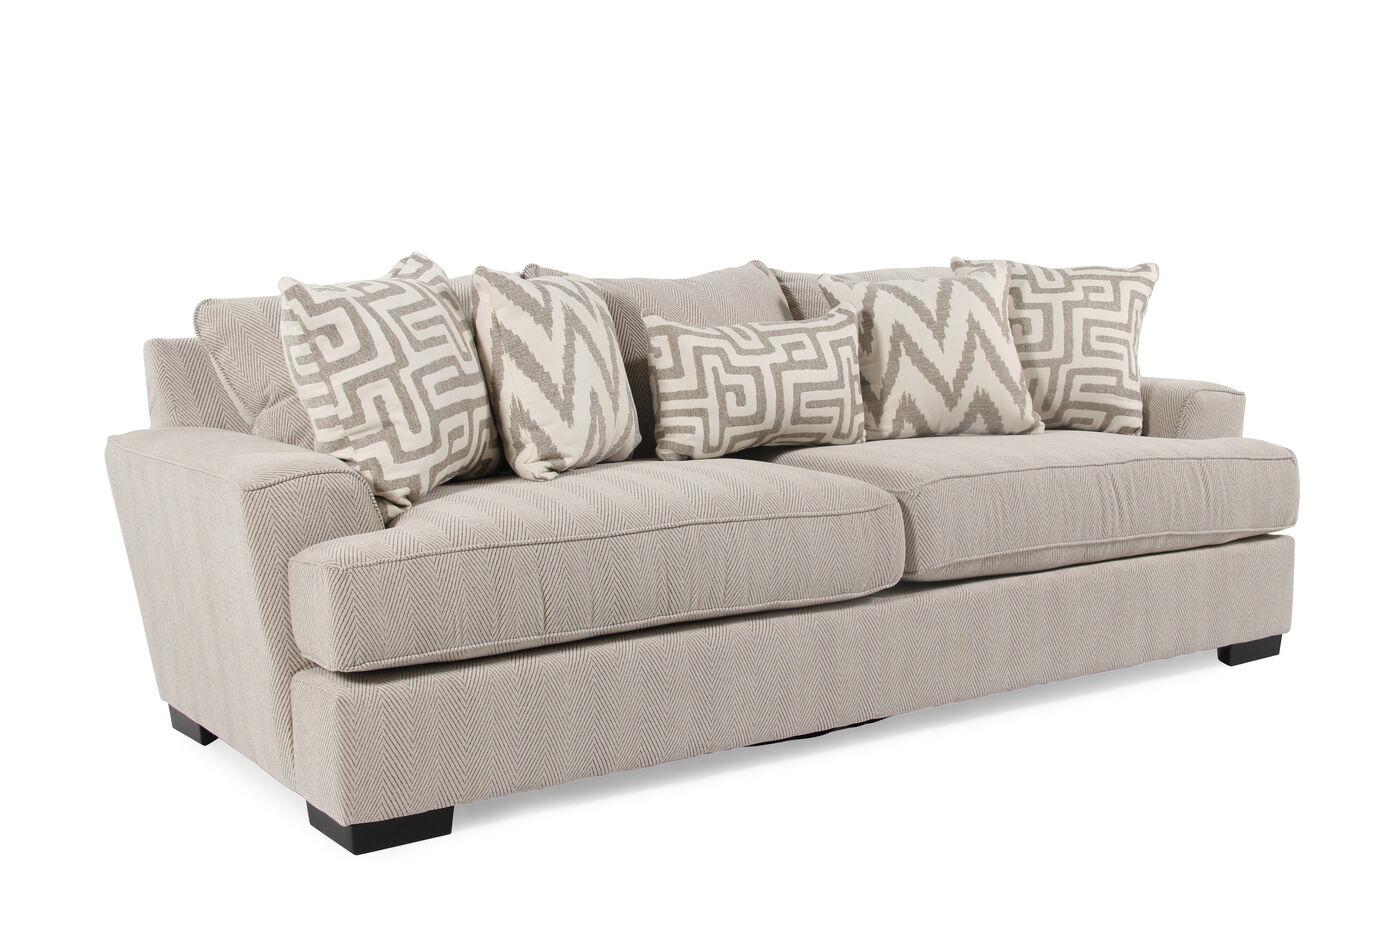 Michael nicholas renegade sofa mathis brothers furniture for Michael apartment sofa